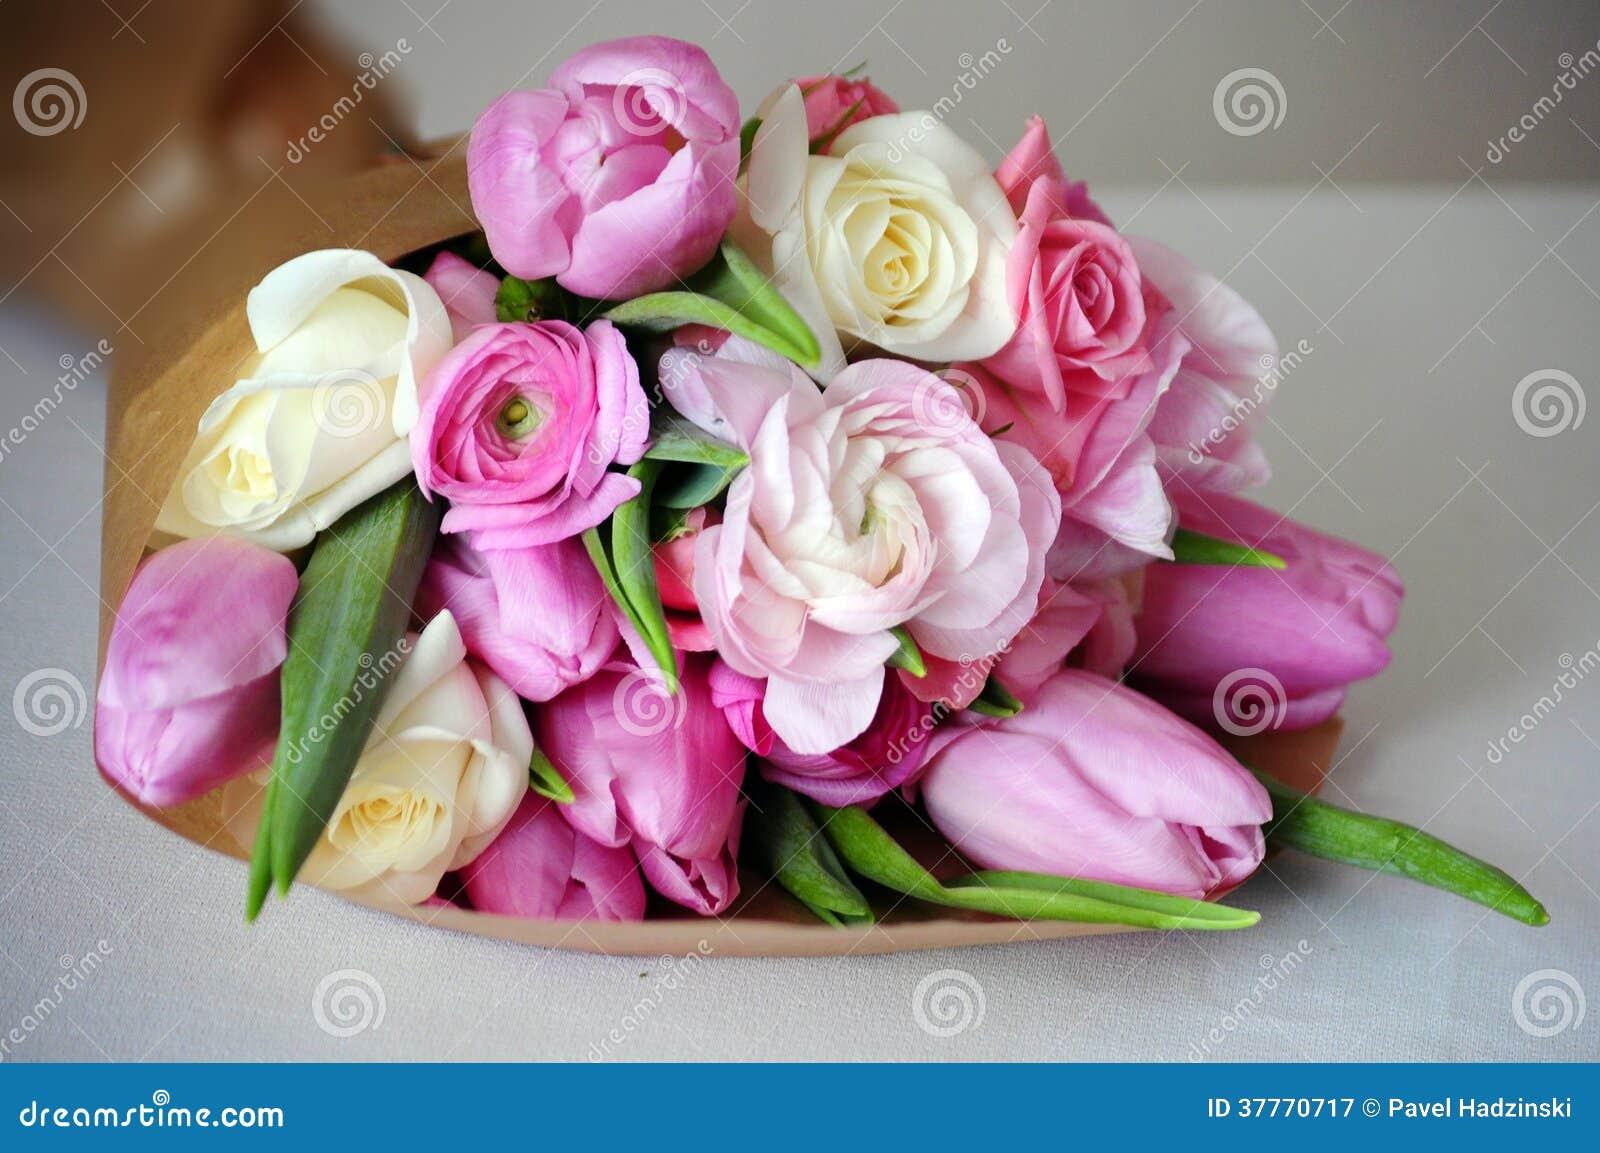 Bouquet Of Ranunculus Tulip Roses Stock Image Image Of Leaf Bloom 37770717